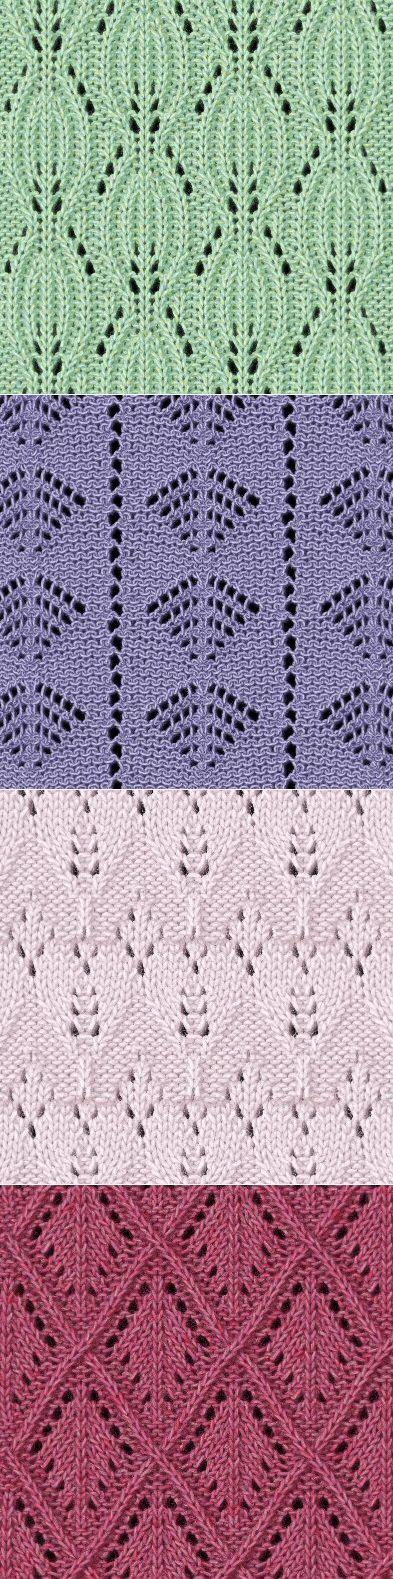 Grapevine Lace Knitting Pattern : Liczba pomysLow na temat: Wzory Na Druty na Pinterescie ...